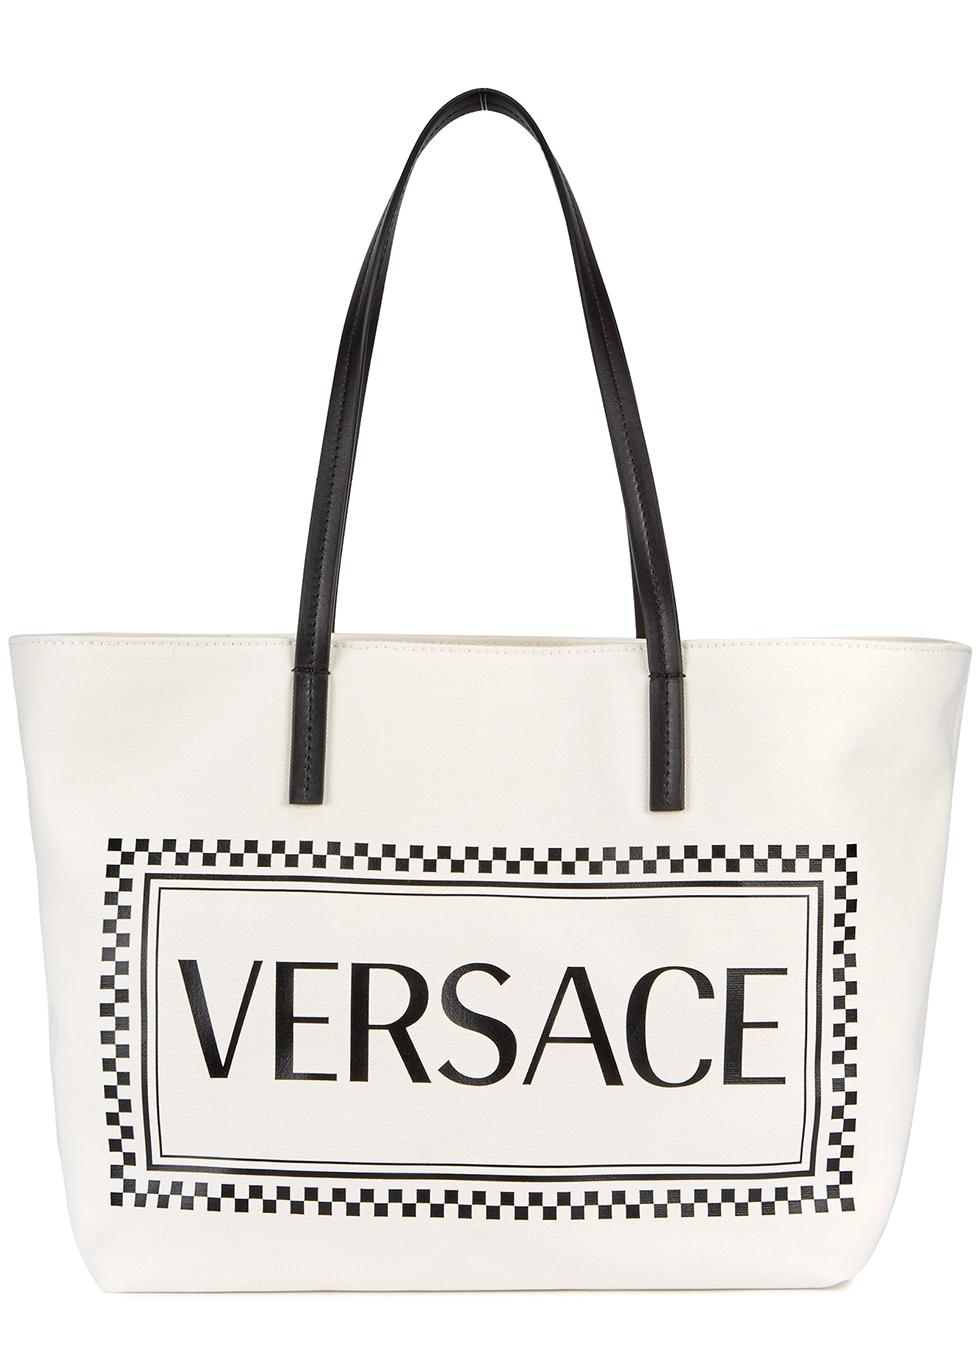 White logo-print canvas tote - Versace